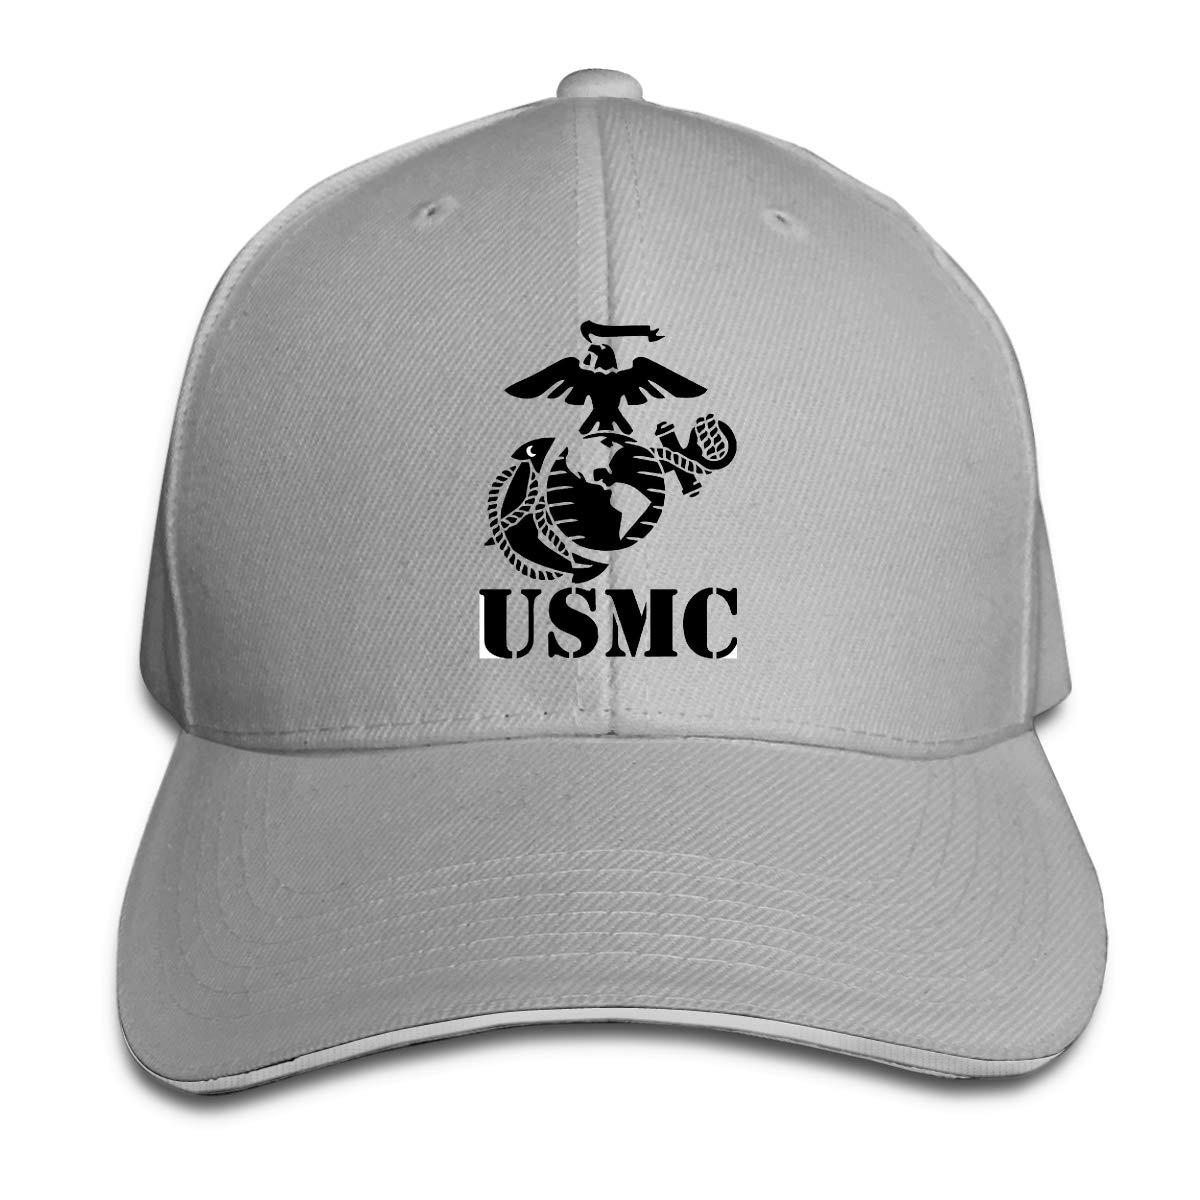 USMC Marine Corps Fashion Adjustable Cotton Baseball Caps Trucker Driver Hat Outdoor Cap Black